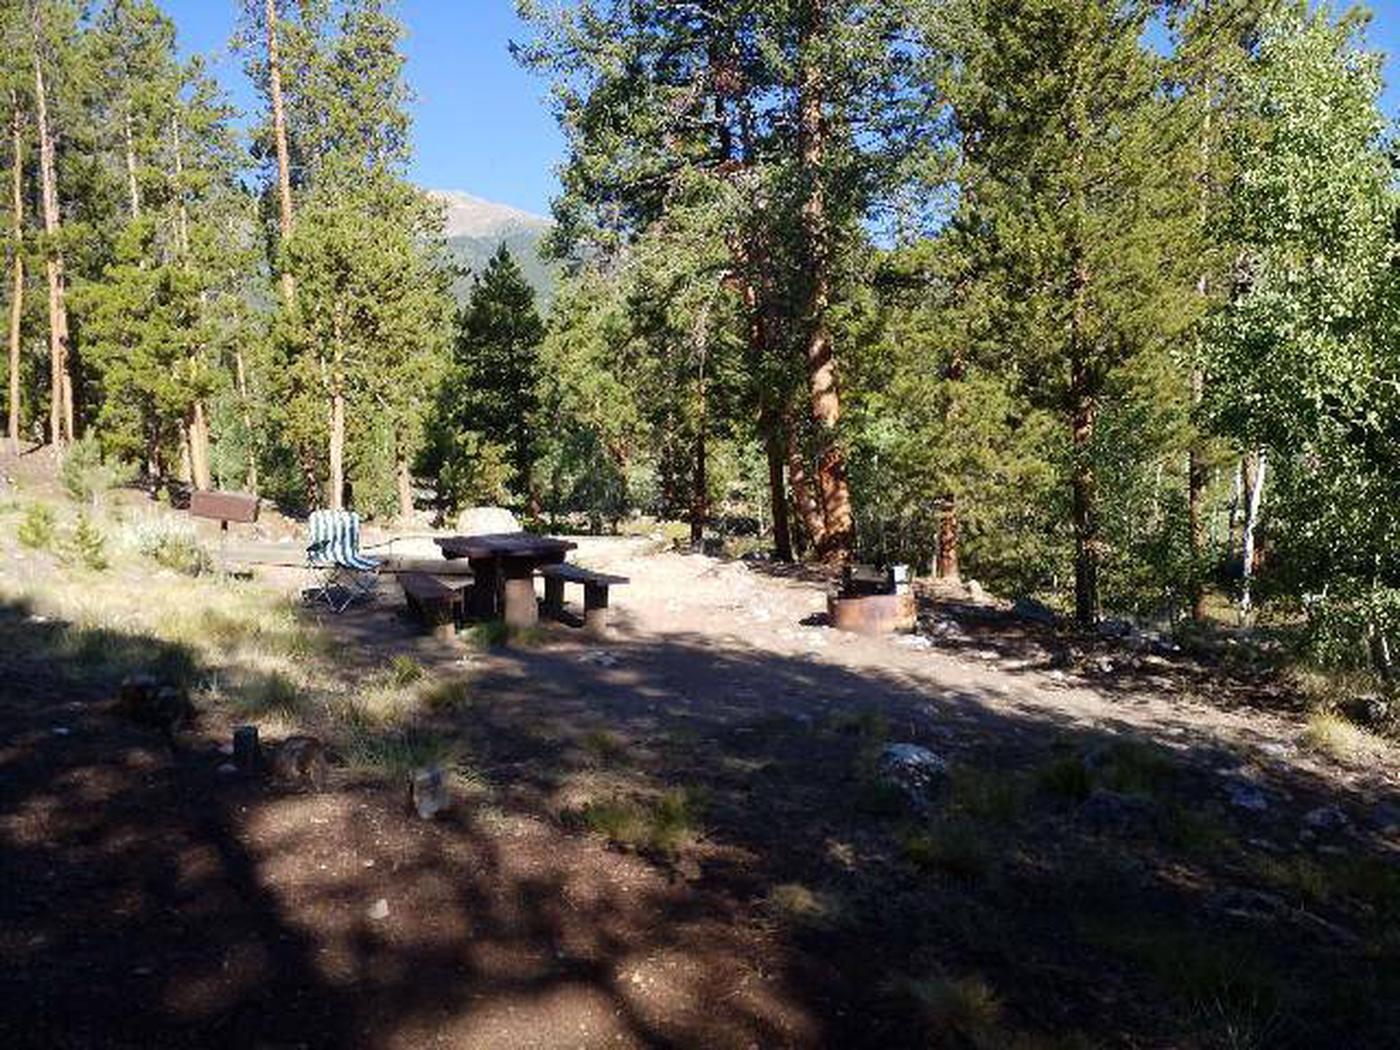 White Star Campground, site 66